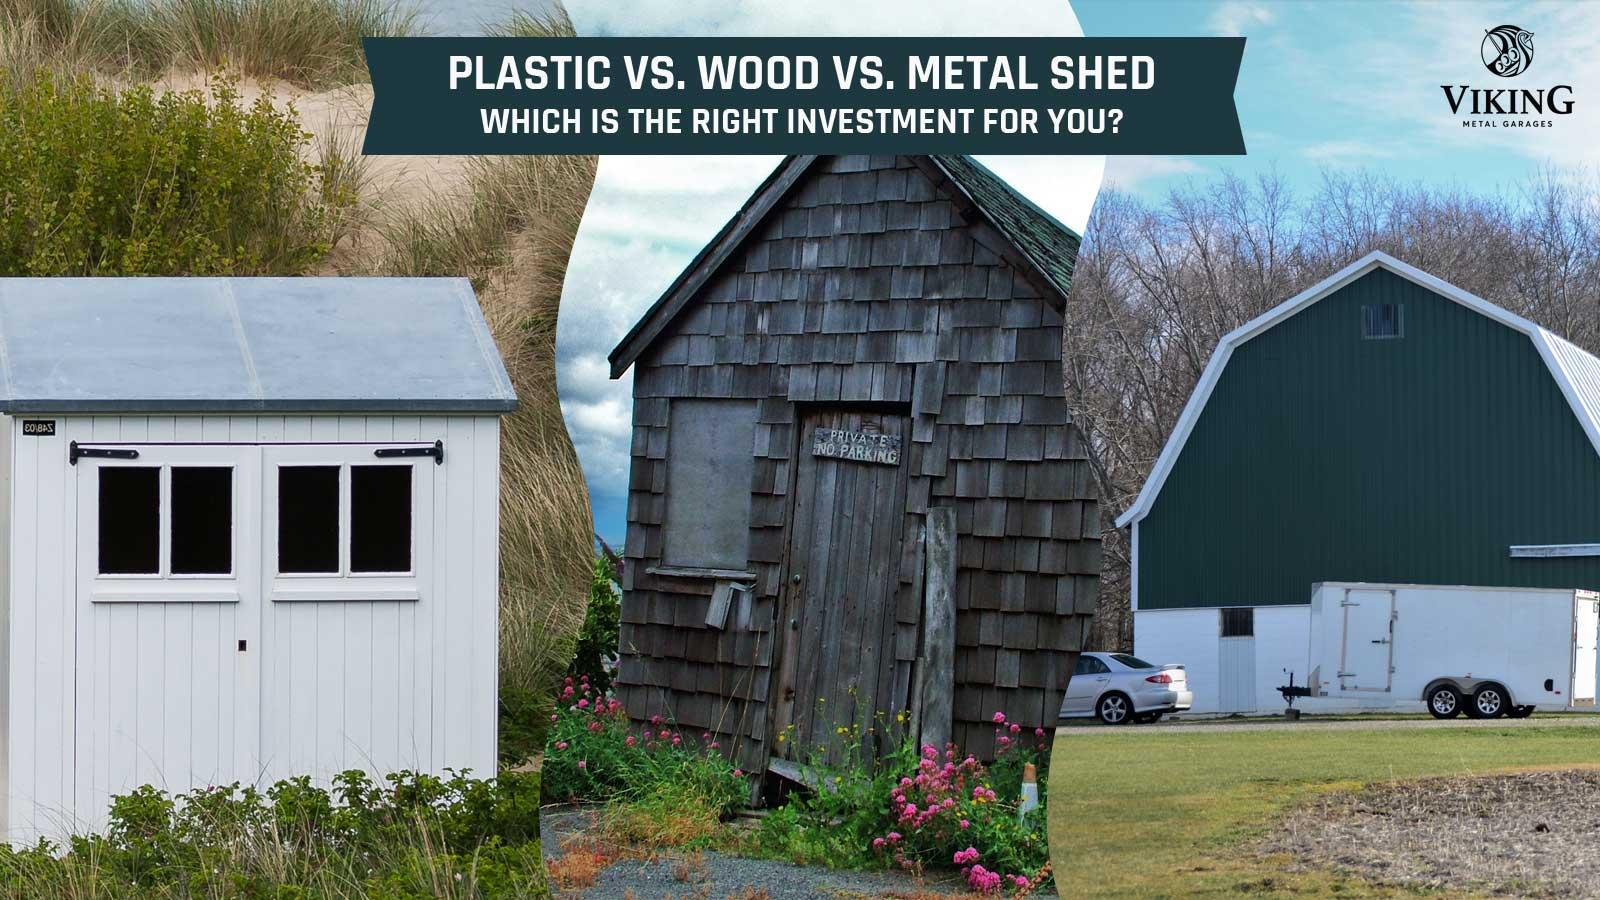 Plastic vs. Wood vs. Metal Shed